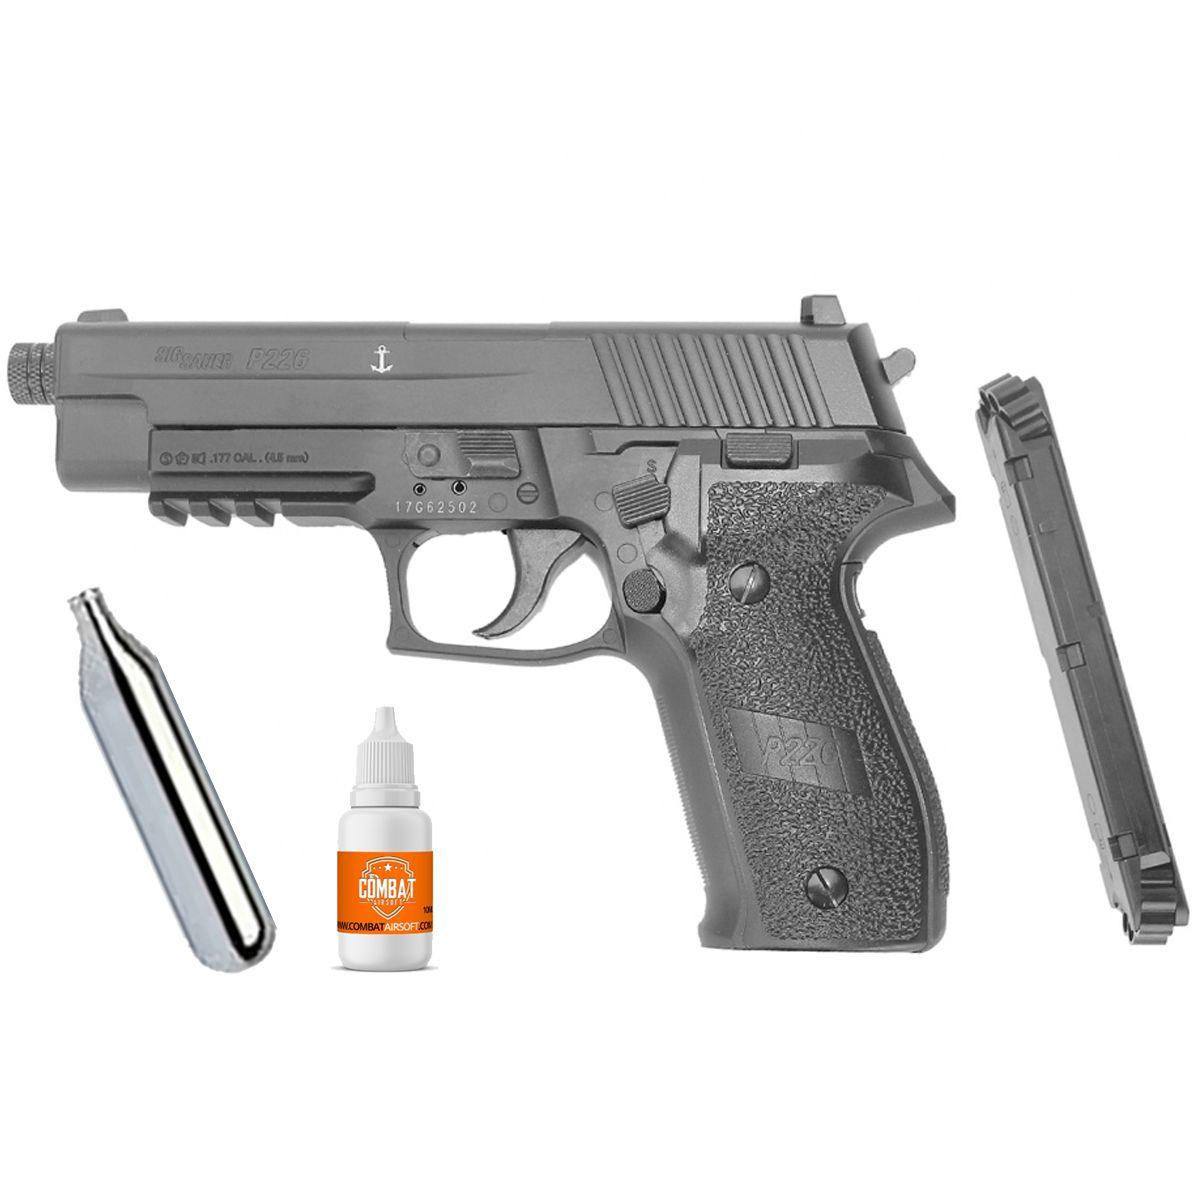 Pistola Pressão Sig Sauer P226 Co2 Full Metal Chumbinho 4,5mm Blowback